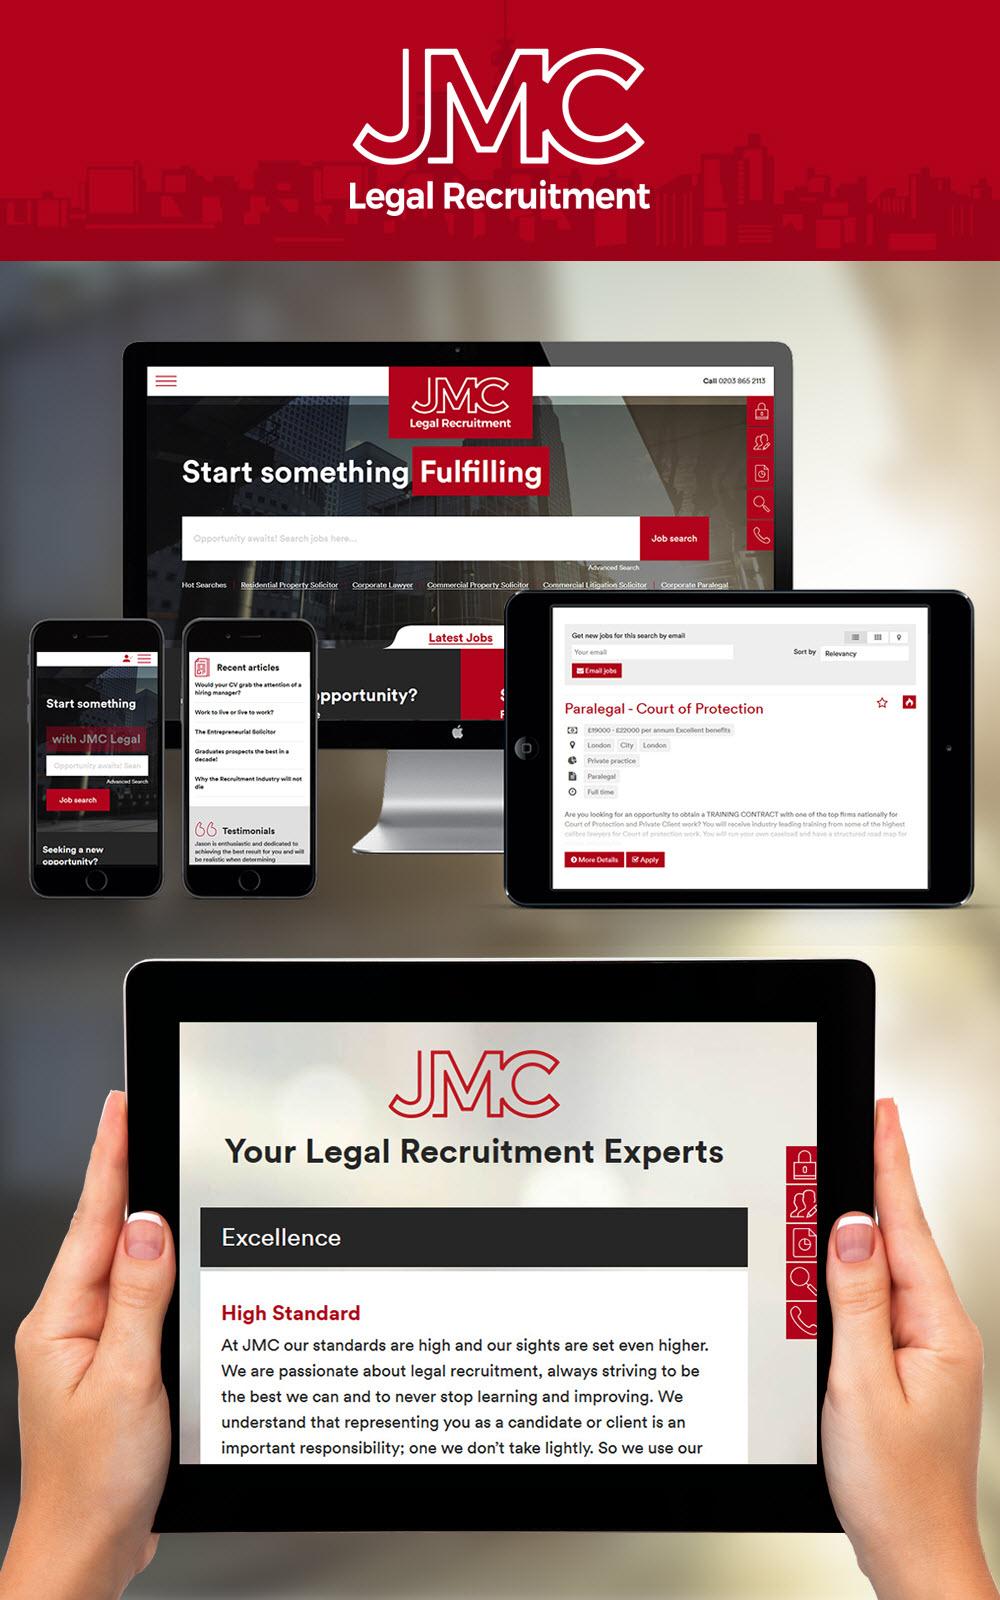 jmc legal recruitment recruitment website design uk job boards jmc legal recruitment